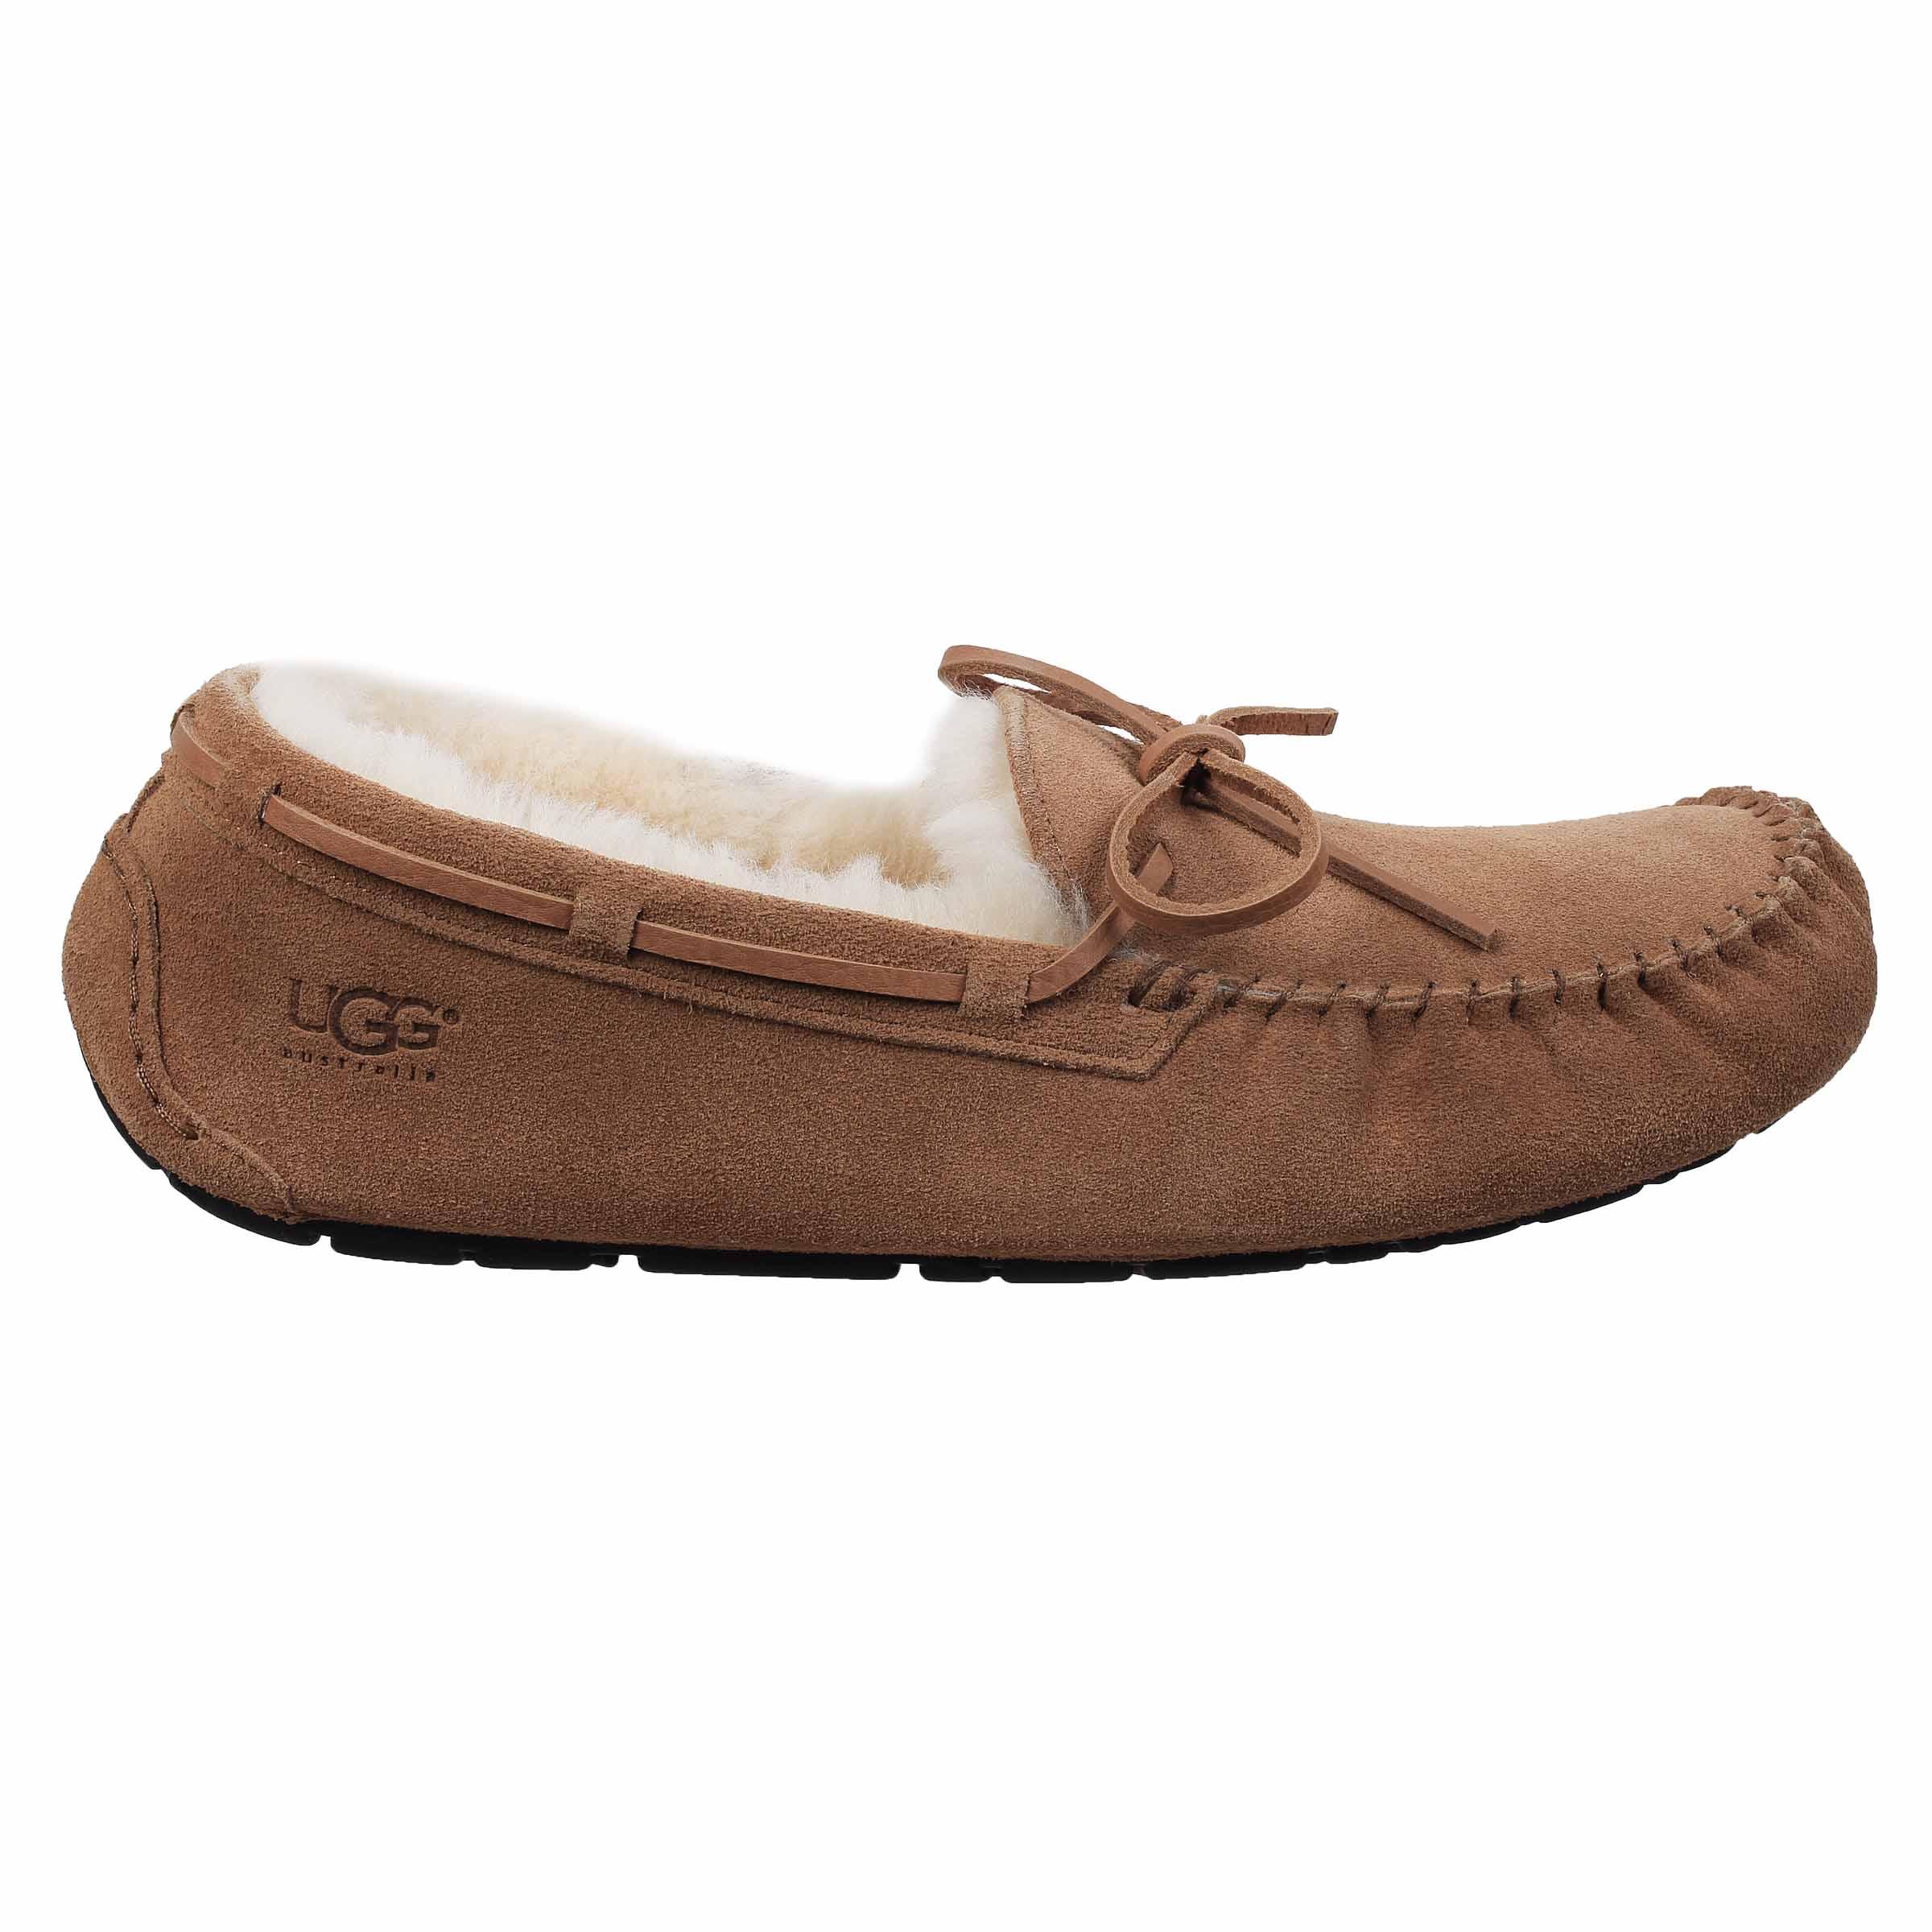 2c24de40e70 Details about UGG Australia Men's Olsen Slipper 1003390 Chestnut Brown Shoes